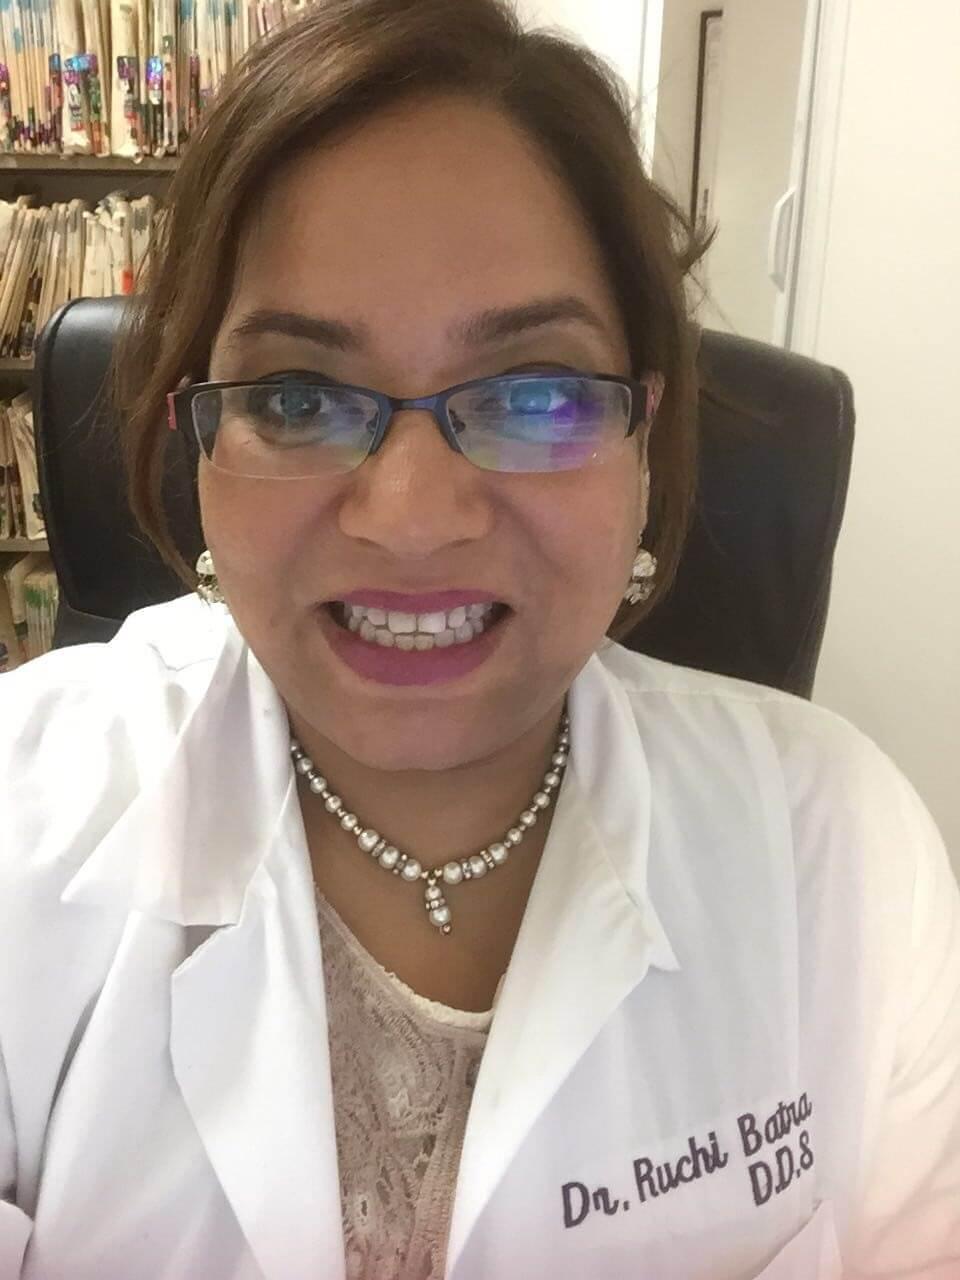 Dr. Ruchi Batra, DDS